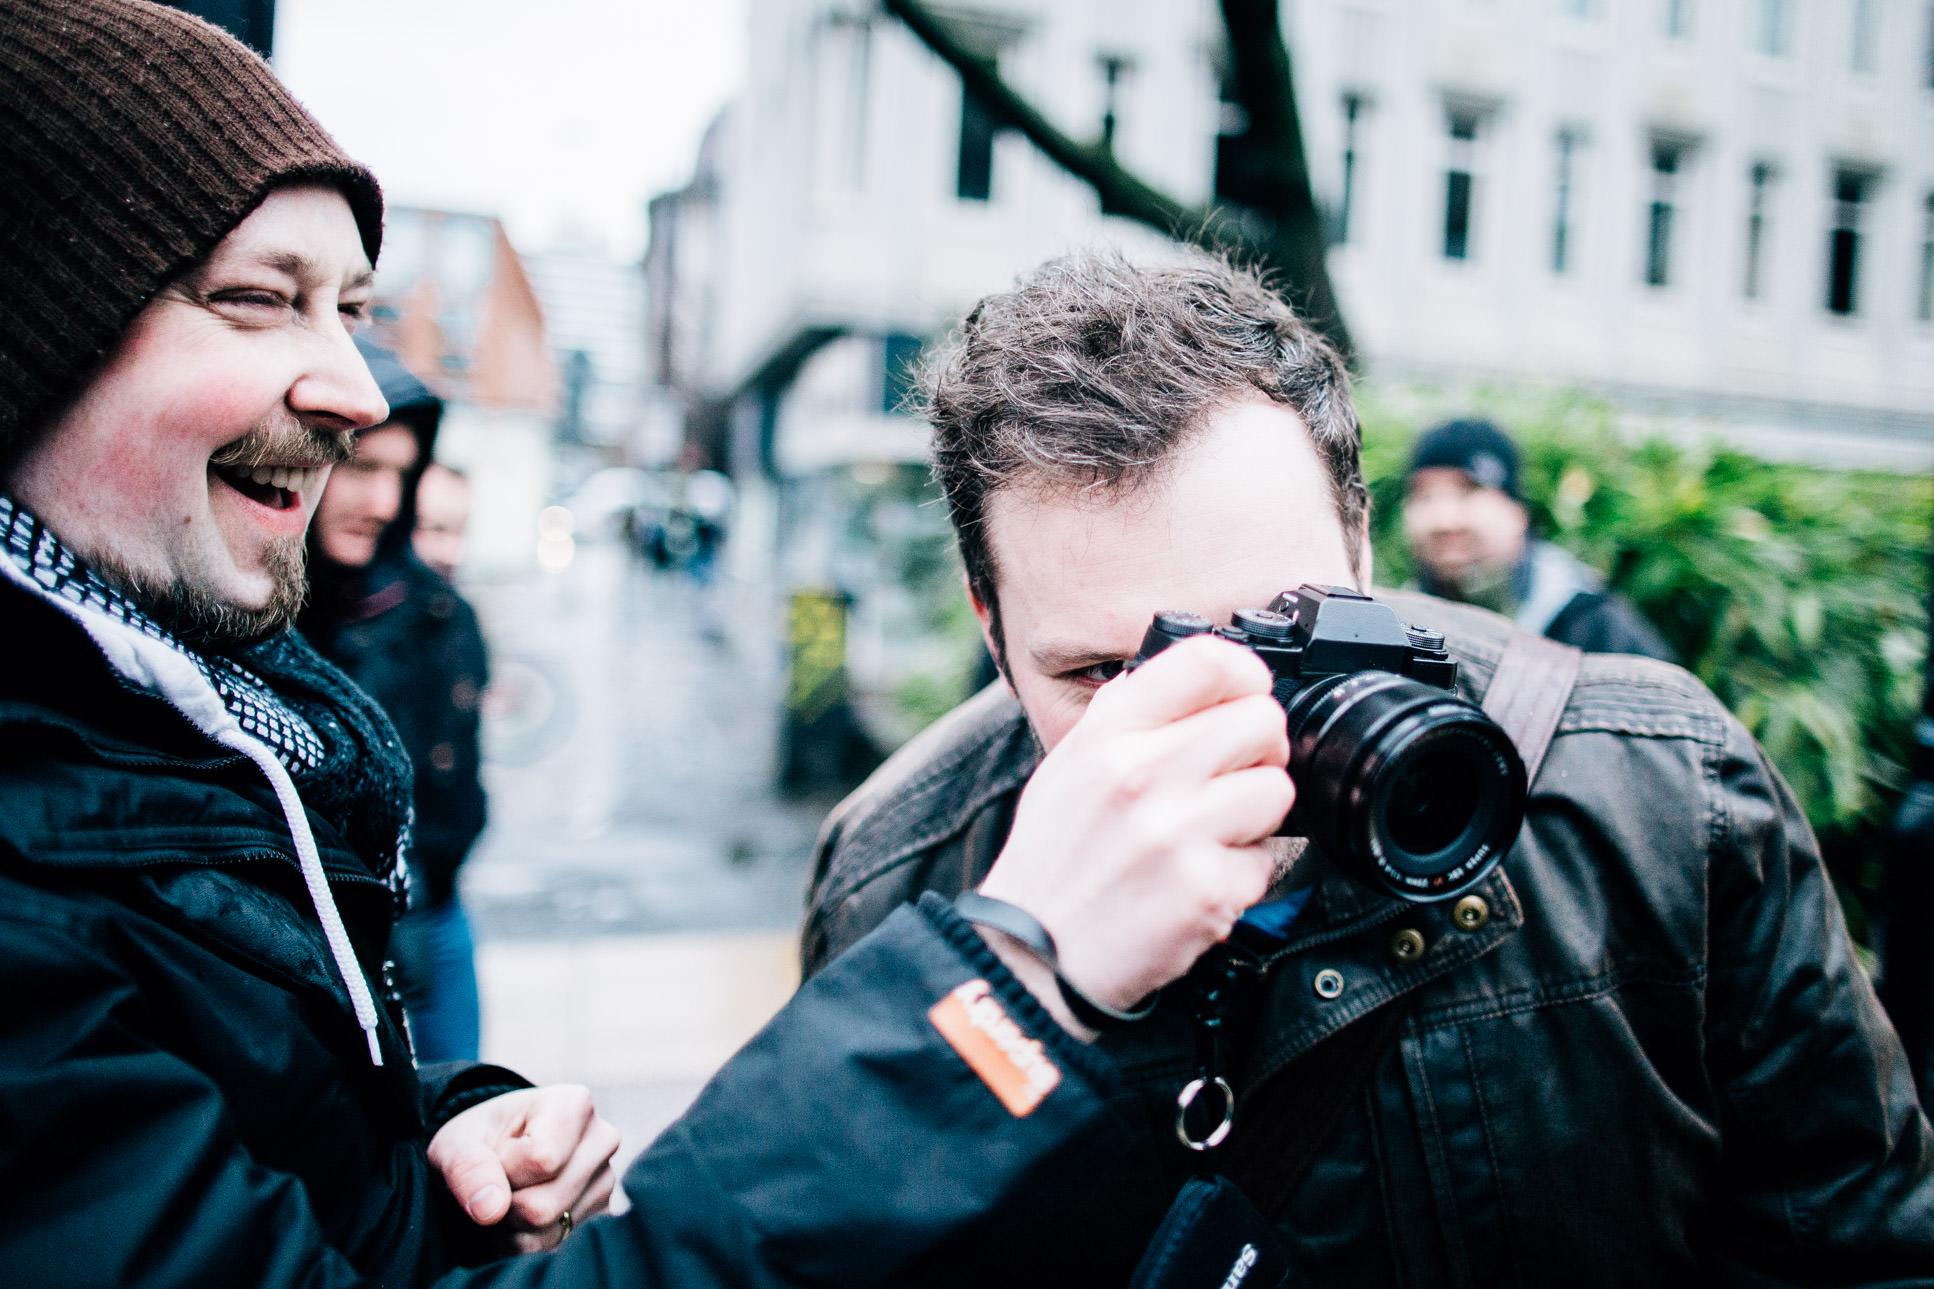 Street Photography29